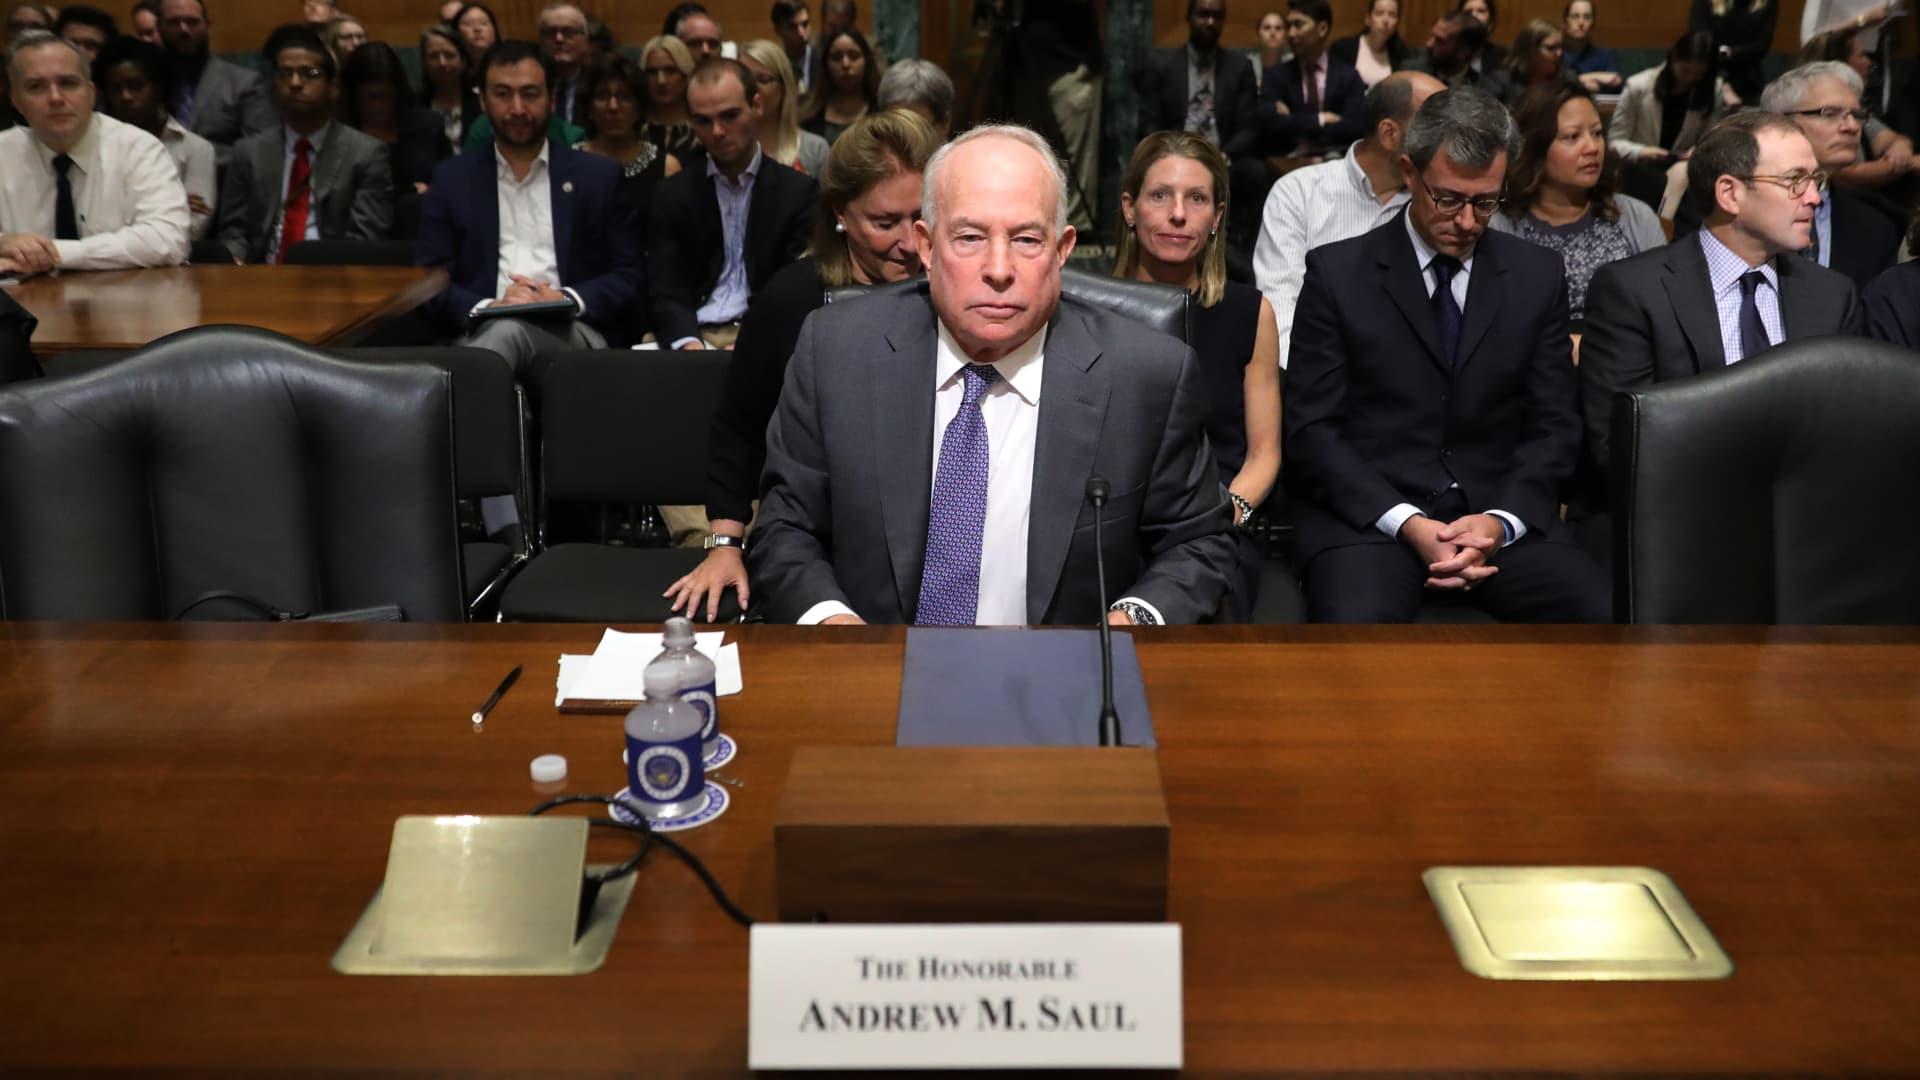 New York businessman Andrew Saul testifies before the Senate Finance Committee on Oct. 2, 2018.